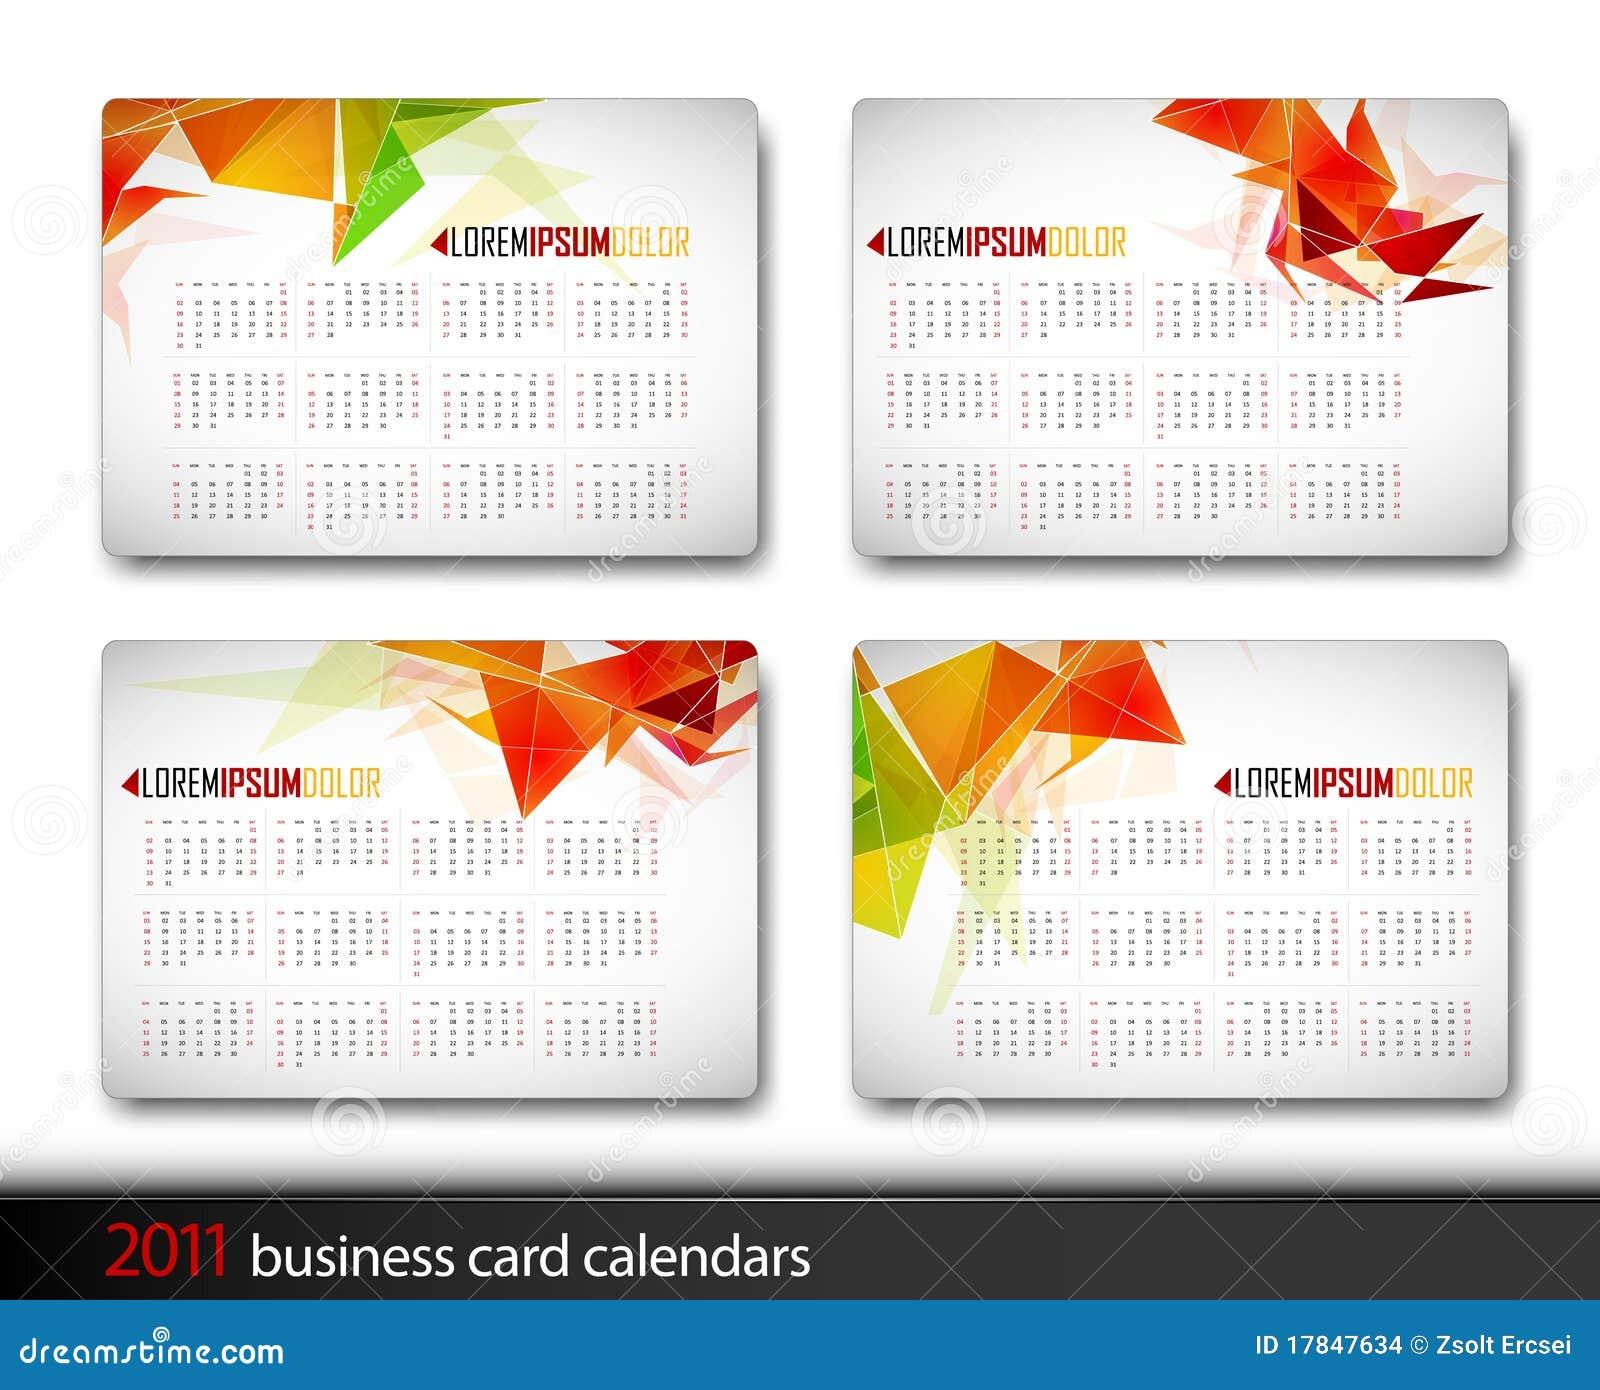 2011 Calendar Template Stock Images - Image: 17847634